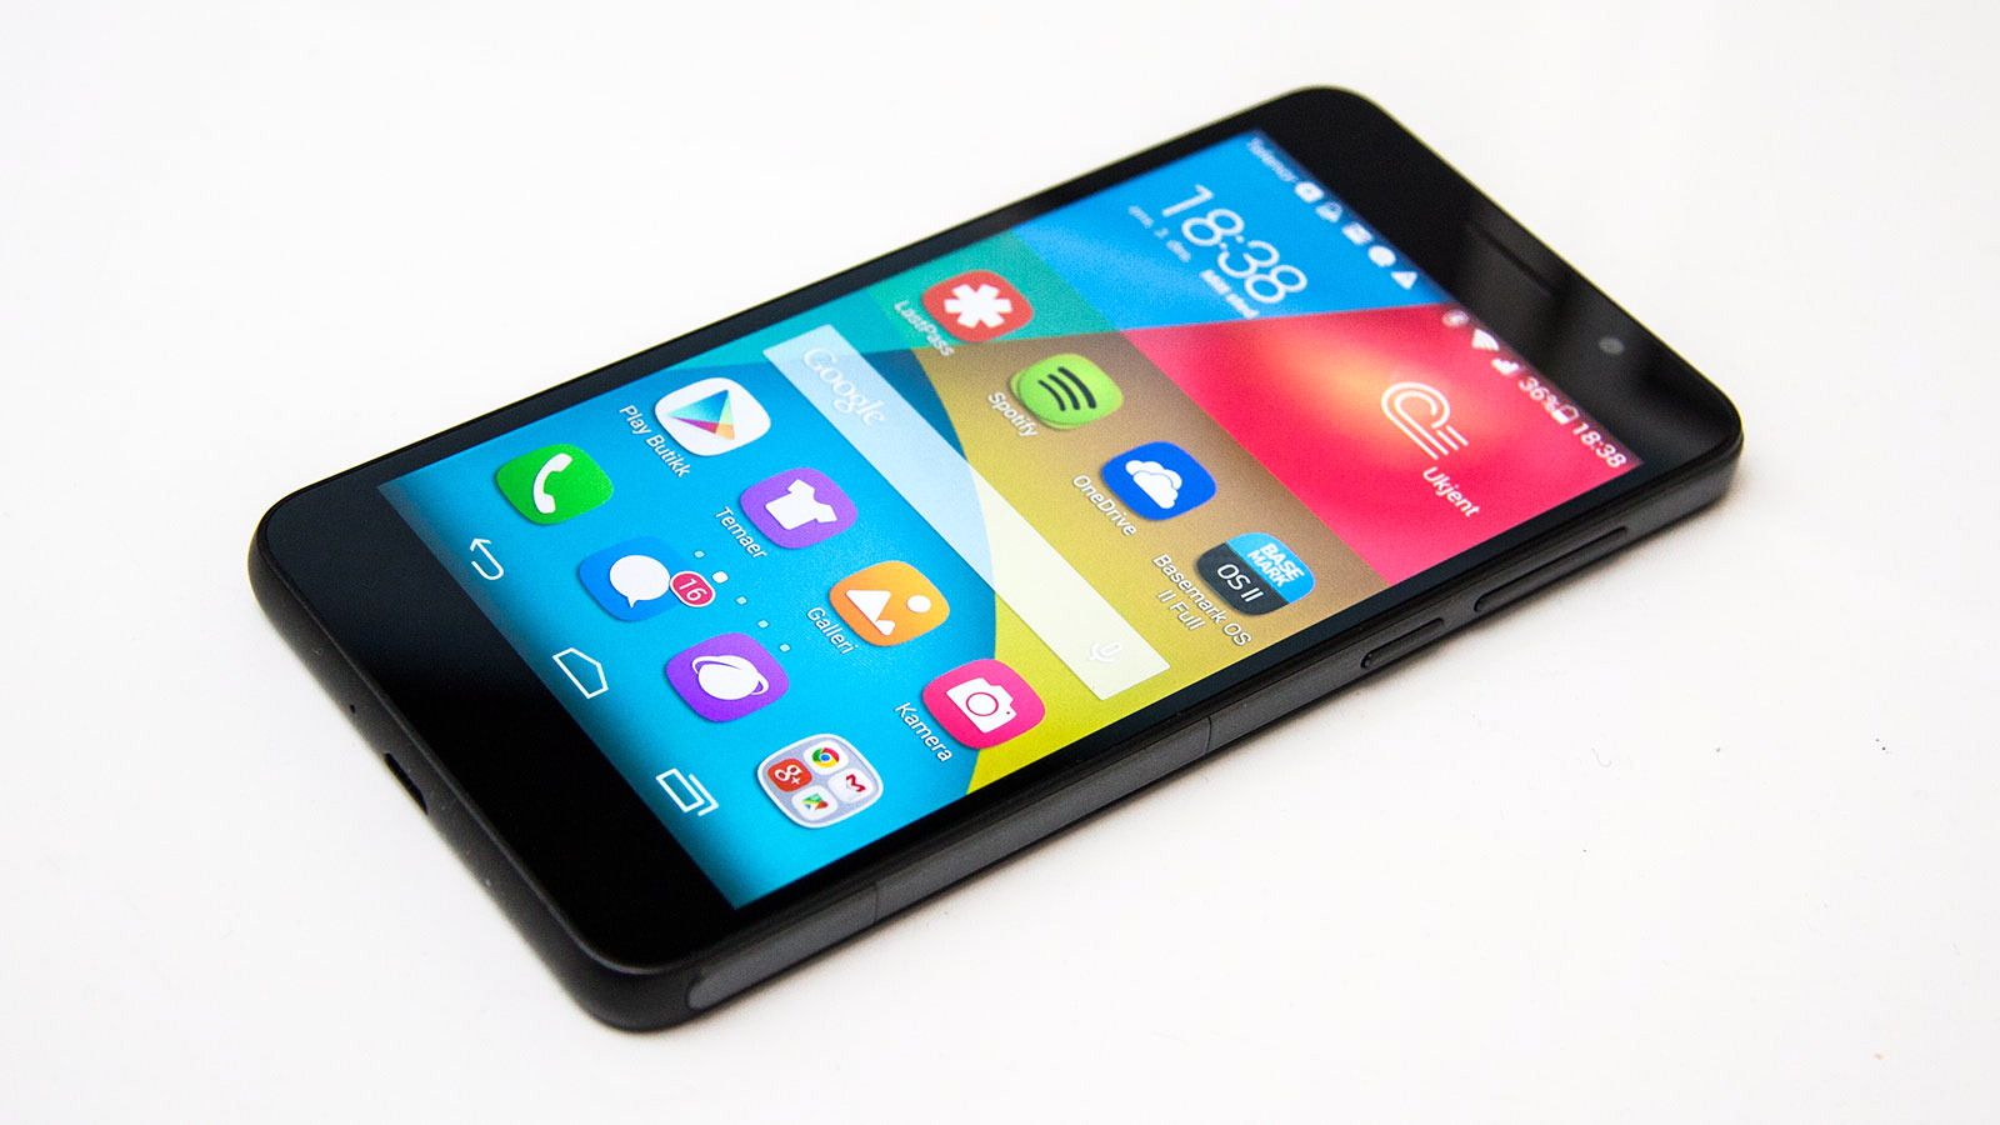 Billig smarttelefon med bra kamera